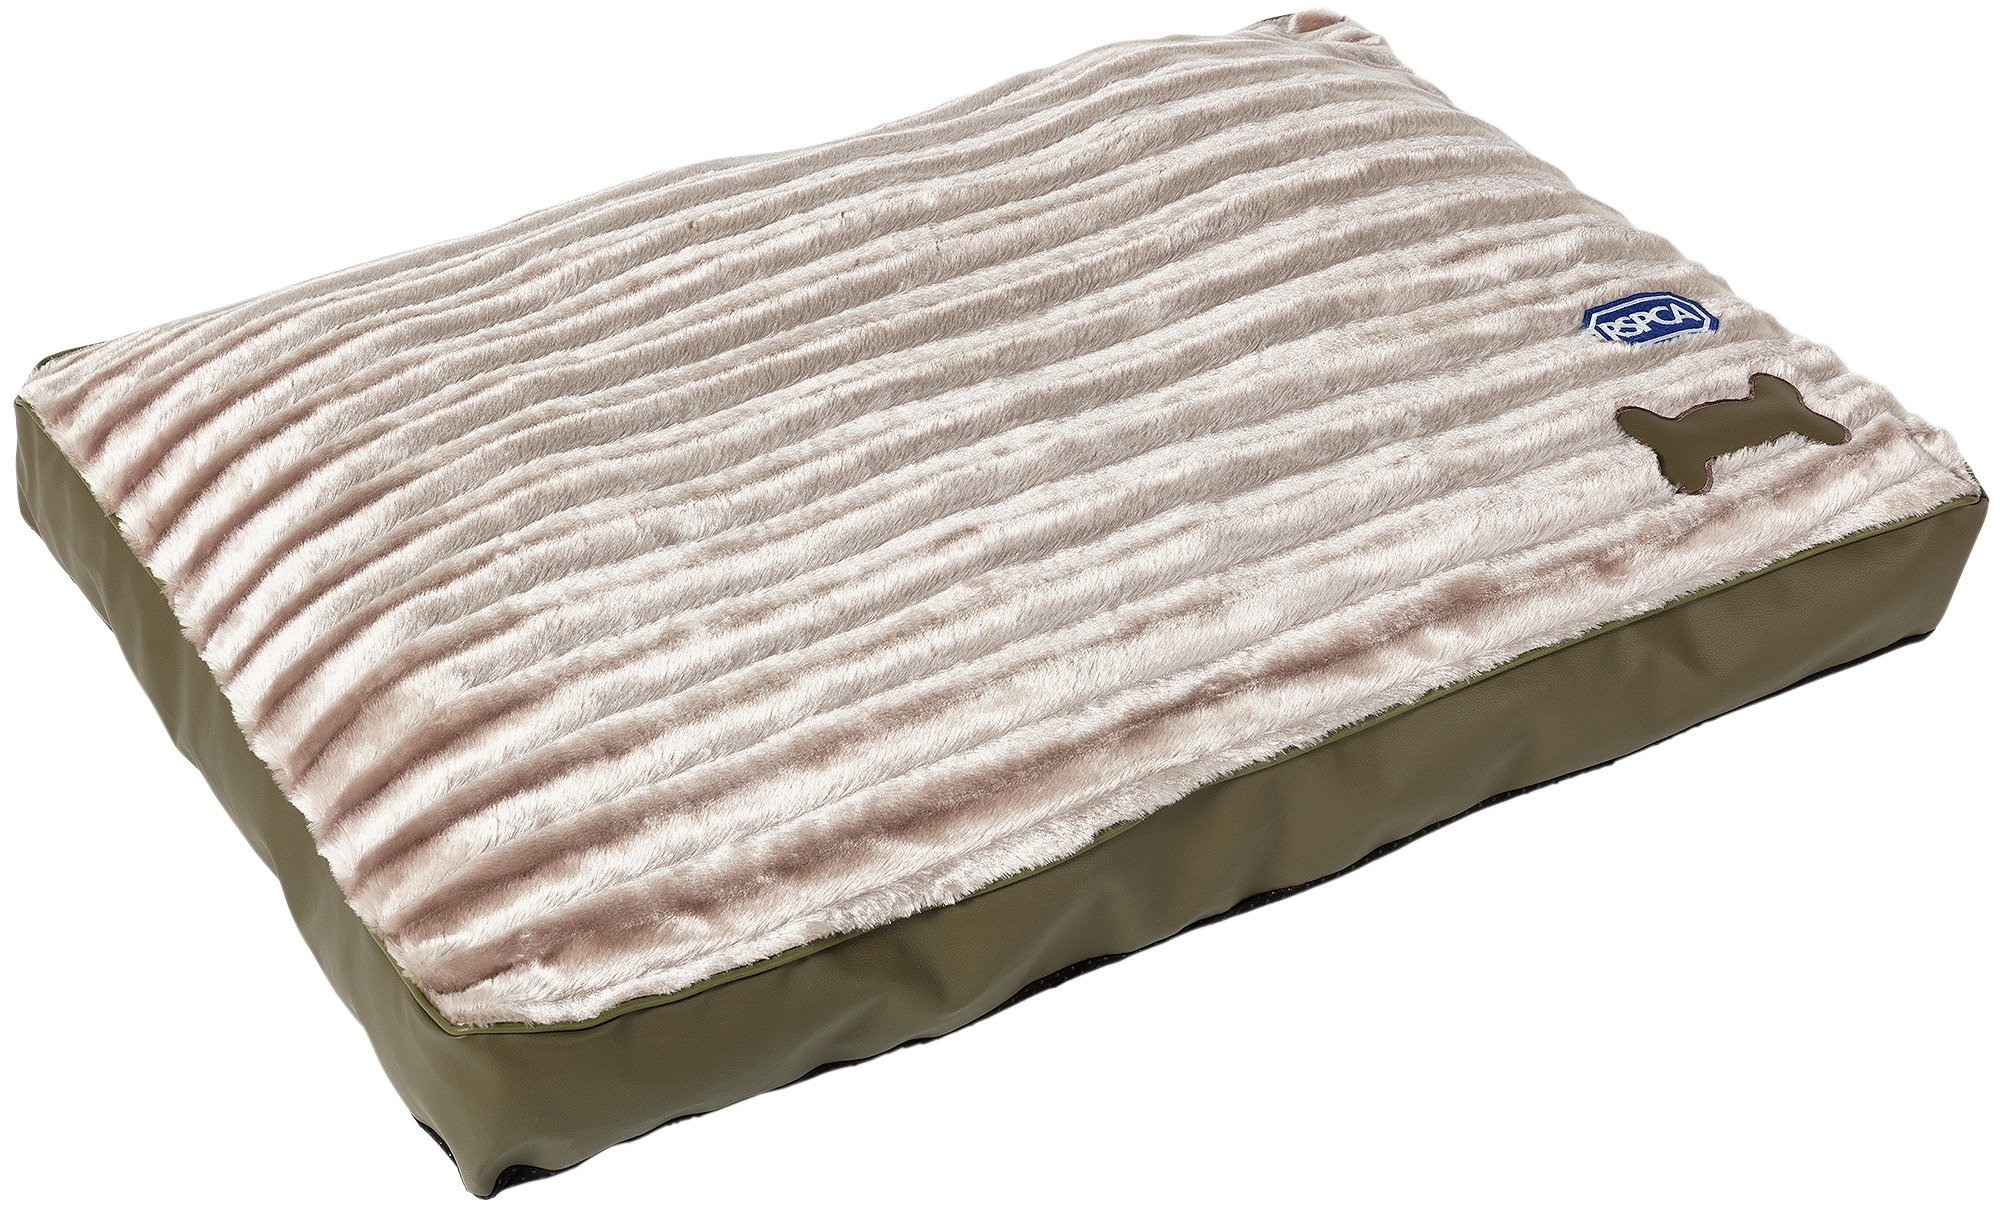 rspca-dog-mattress-extra-large